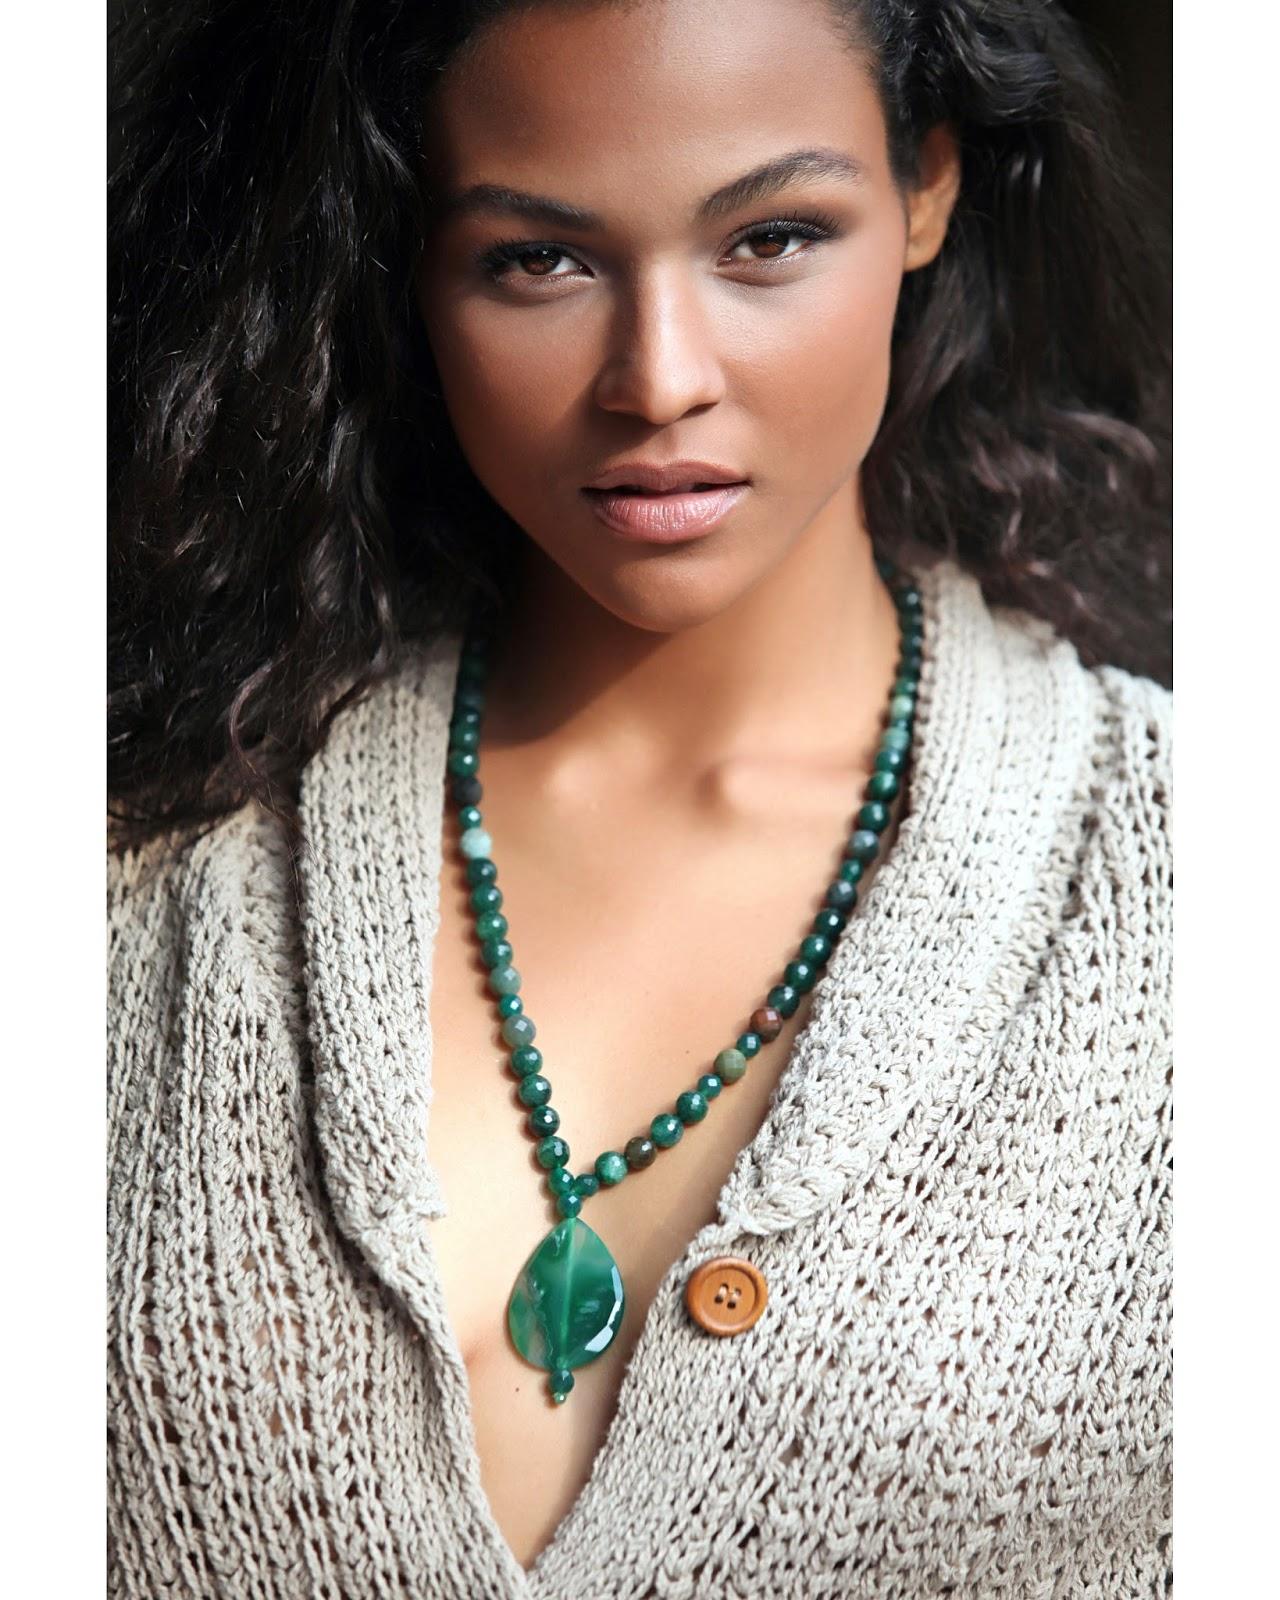 hosana elliot, semifinalista de top model of the world 2018/miss rio de janeiro 2014. Pfnvdgdc